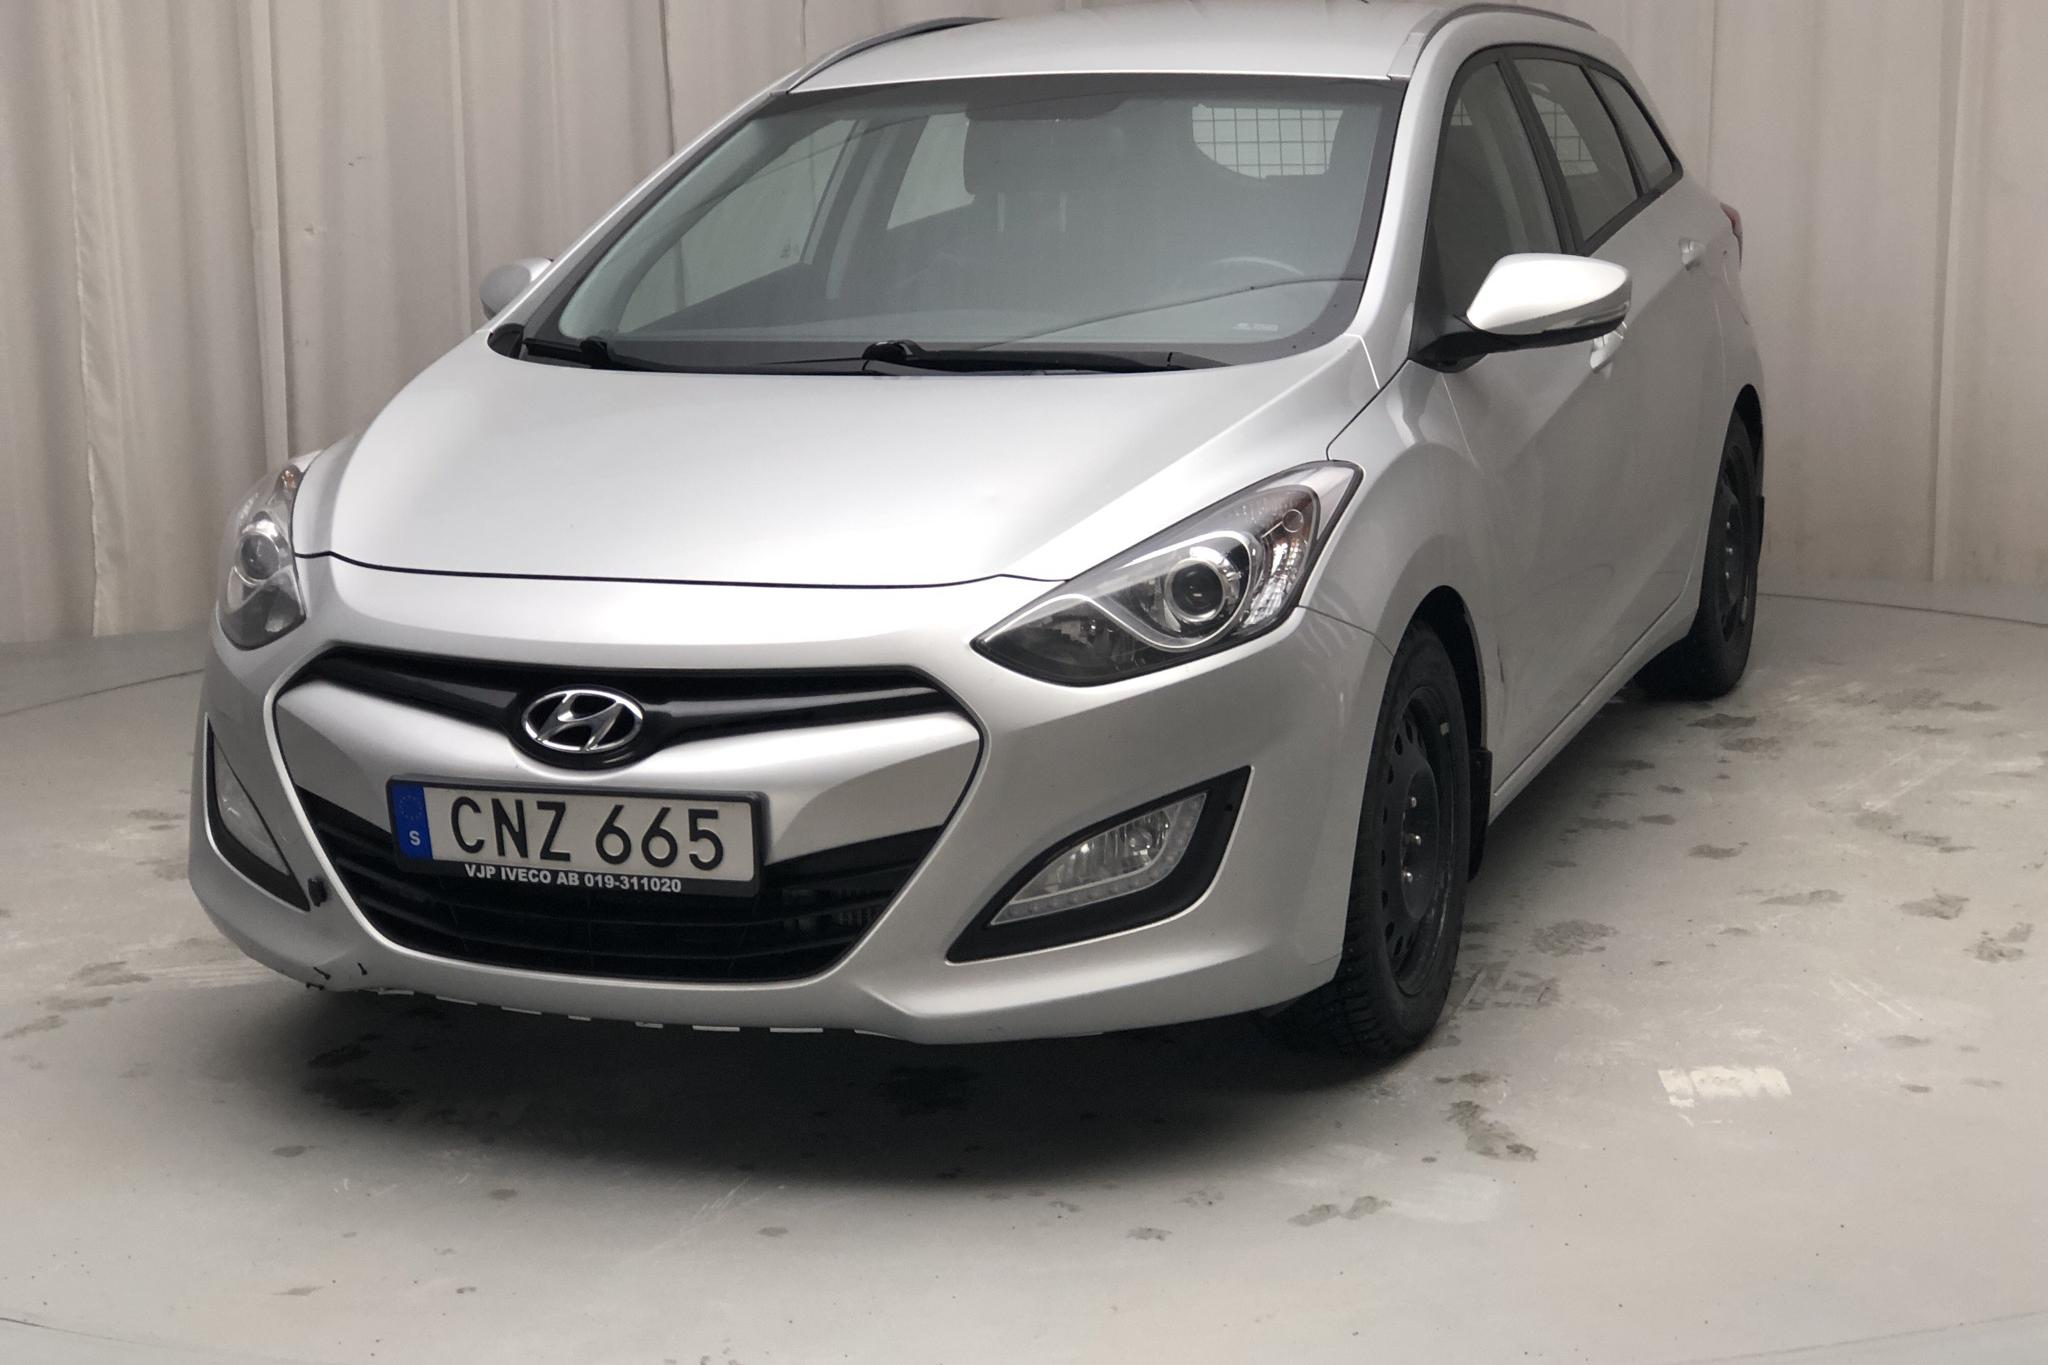 Hyundai i30 1.6 CRDi Kombi (110hk) - 11 106 mil - Manuell - silver - 2014